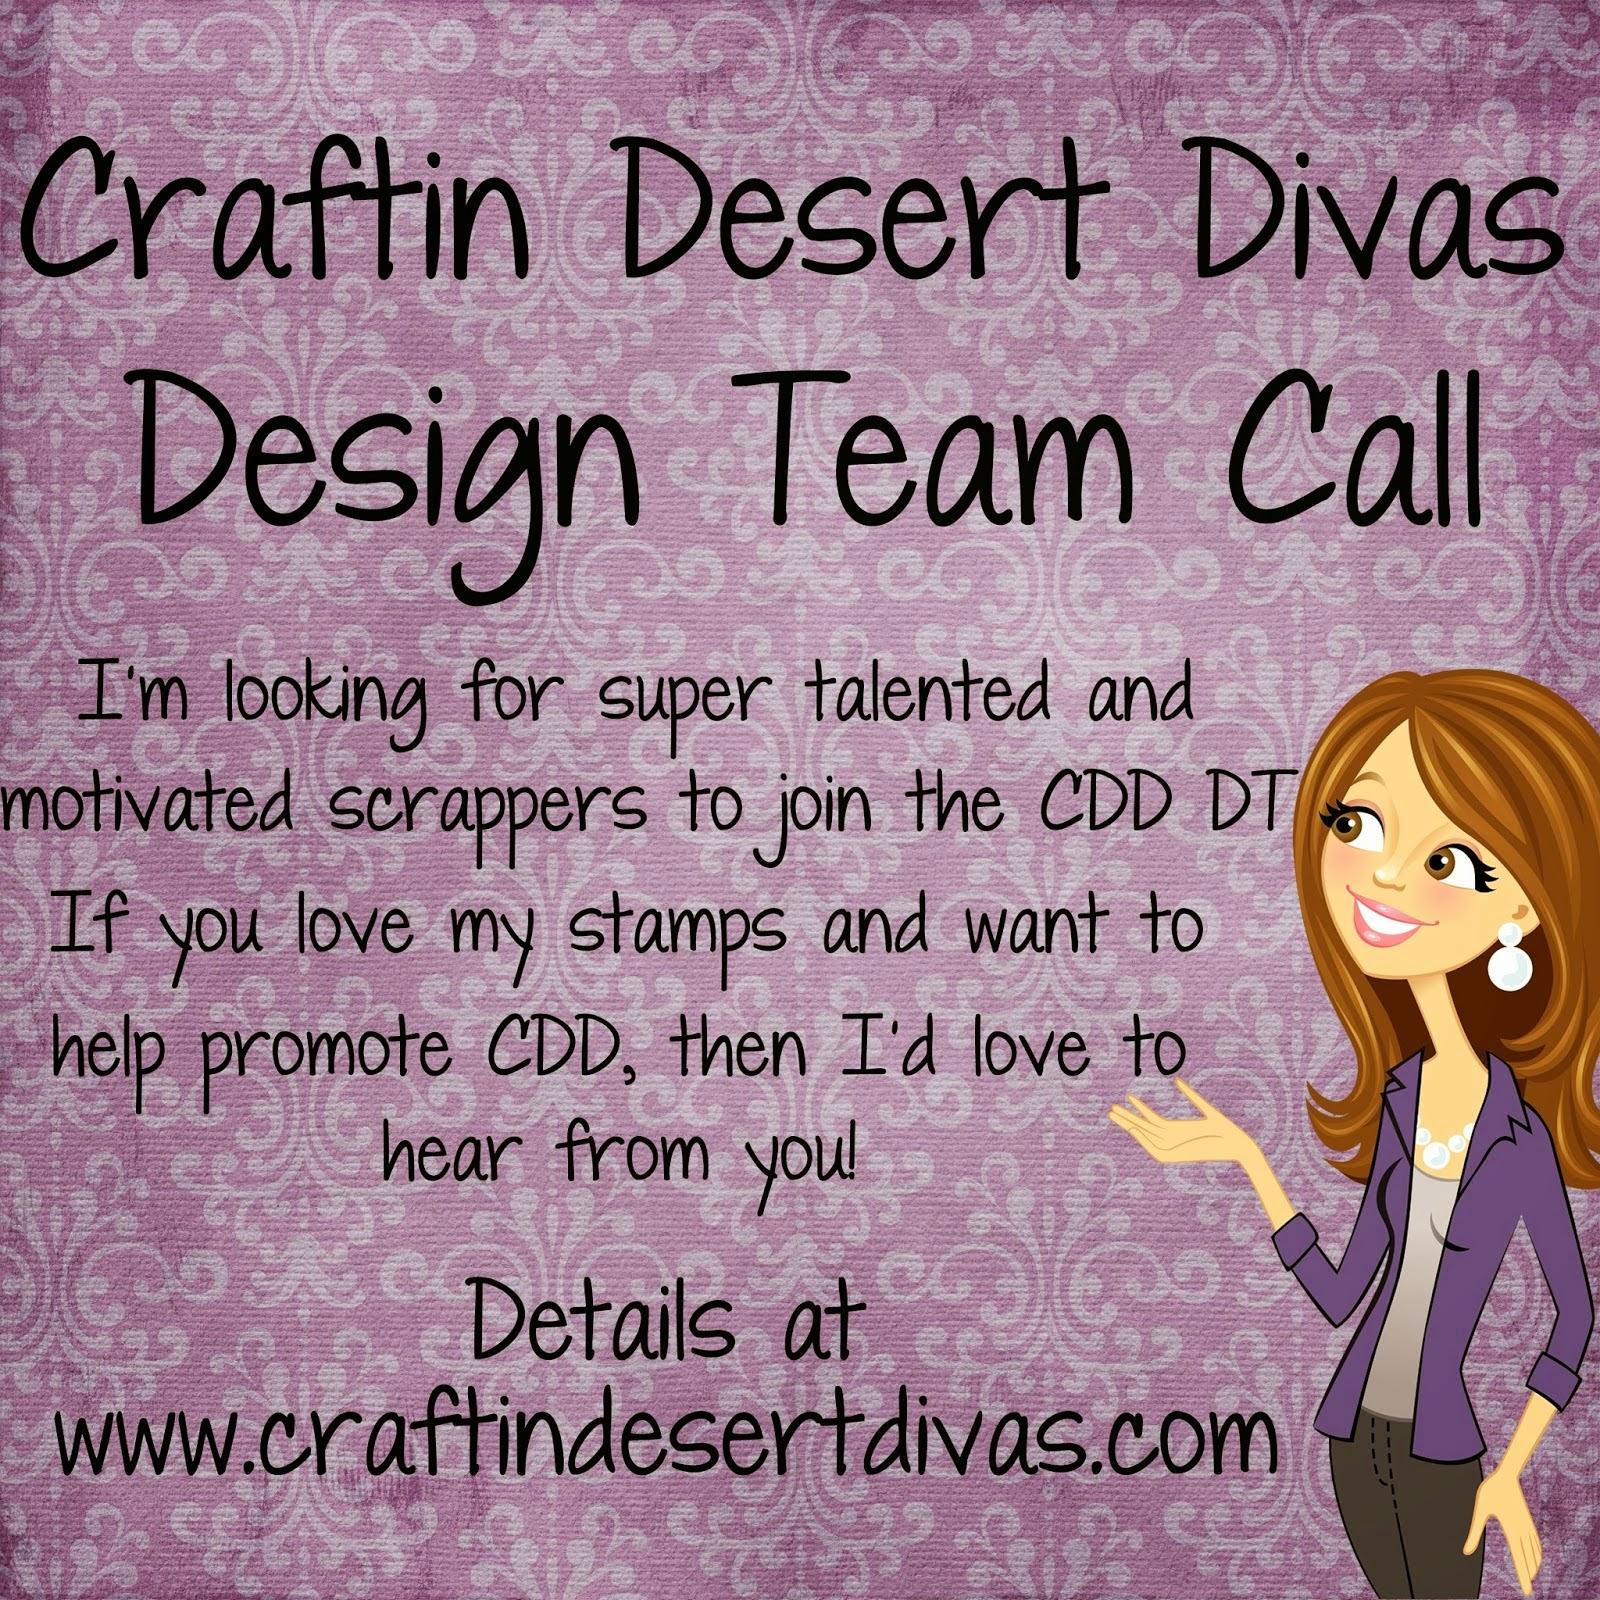 CDD DT Call